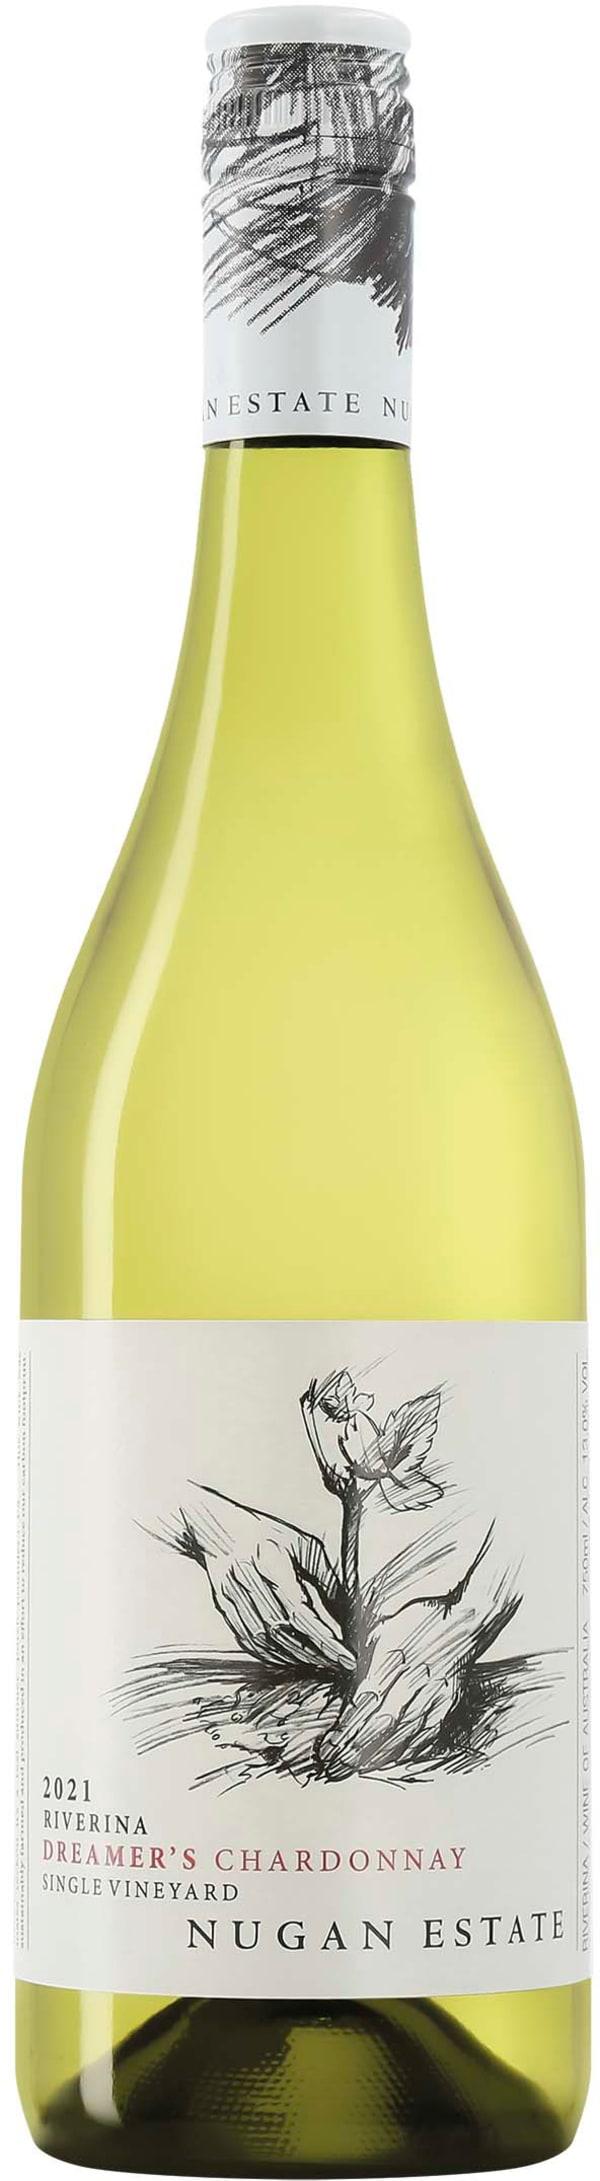 Nugan Dreamer´s Chardonnay 2019